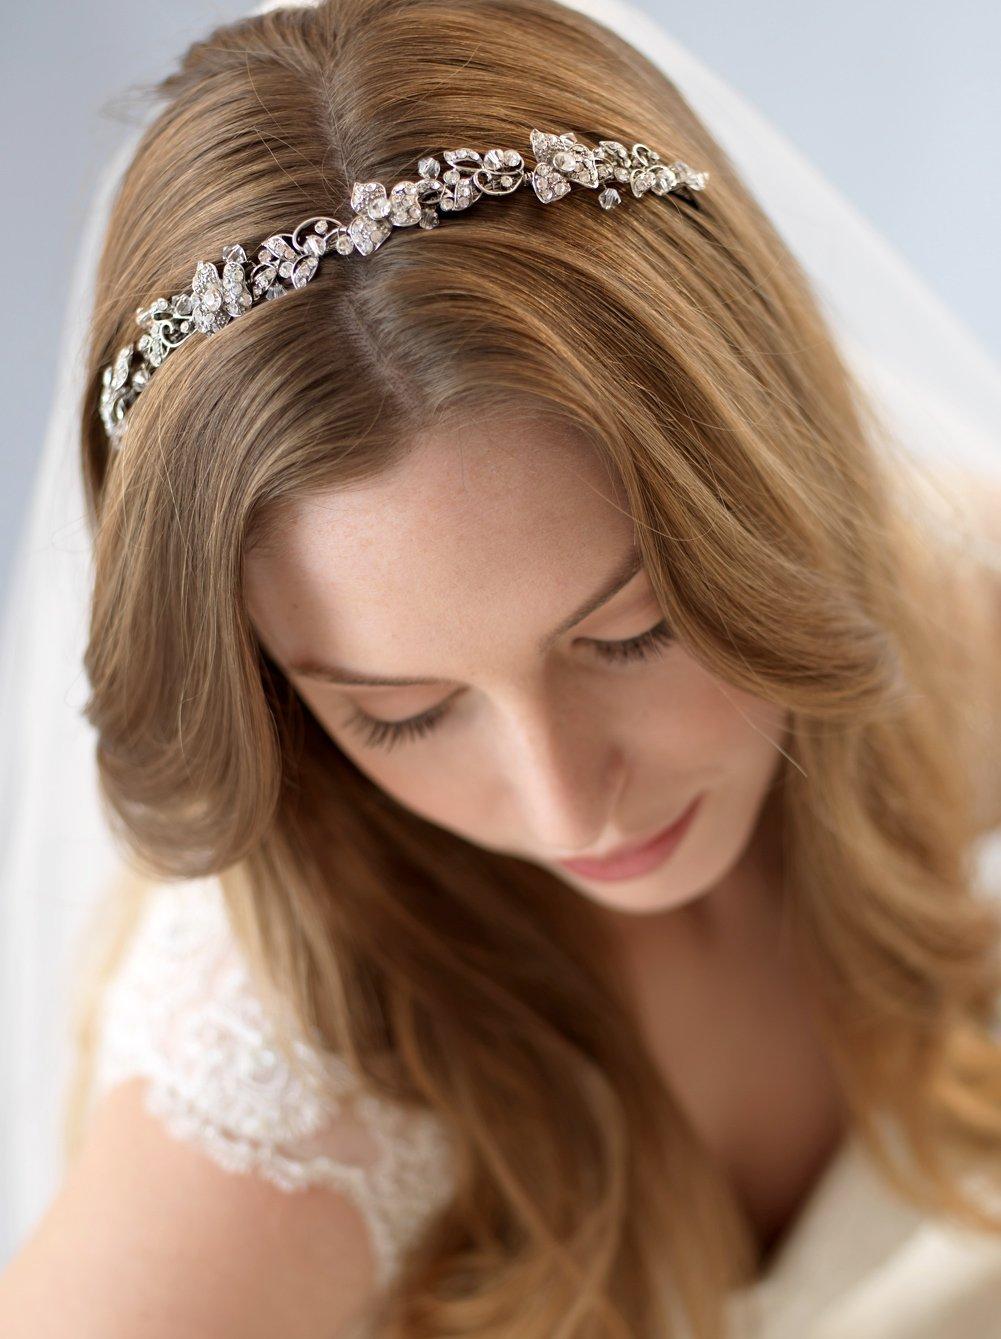 USABride Wedding Headband Silver Tone Rhinestone Vintage Headpiece Floral Bridal 3169